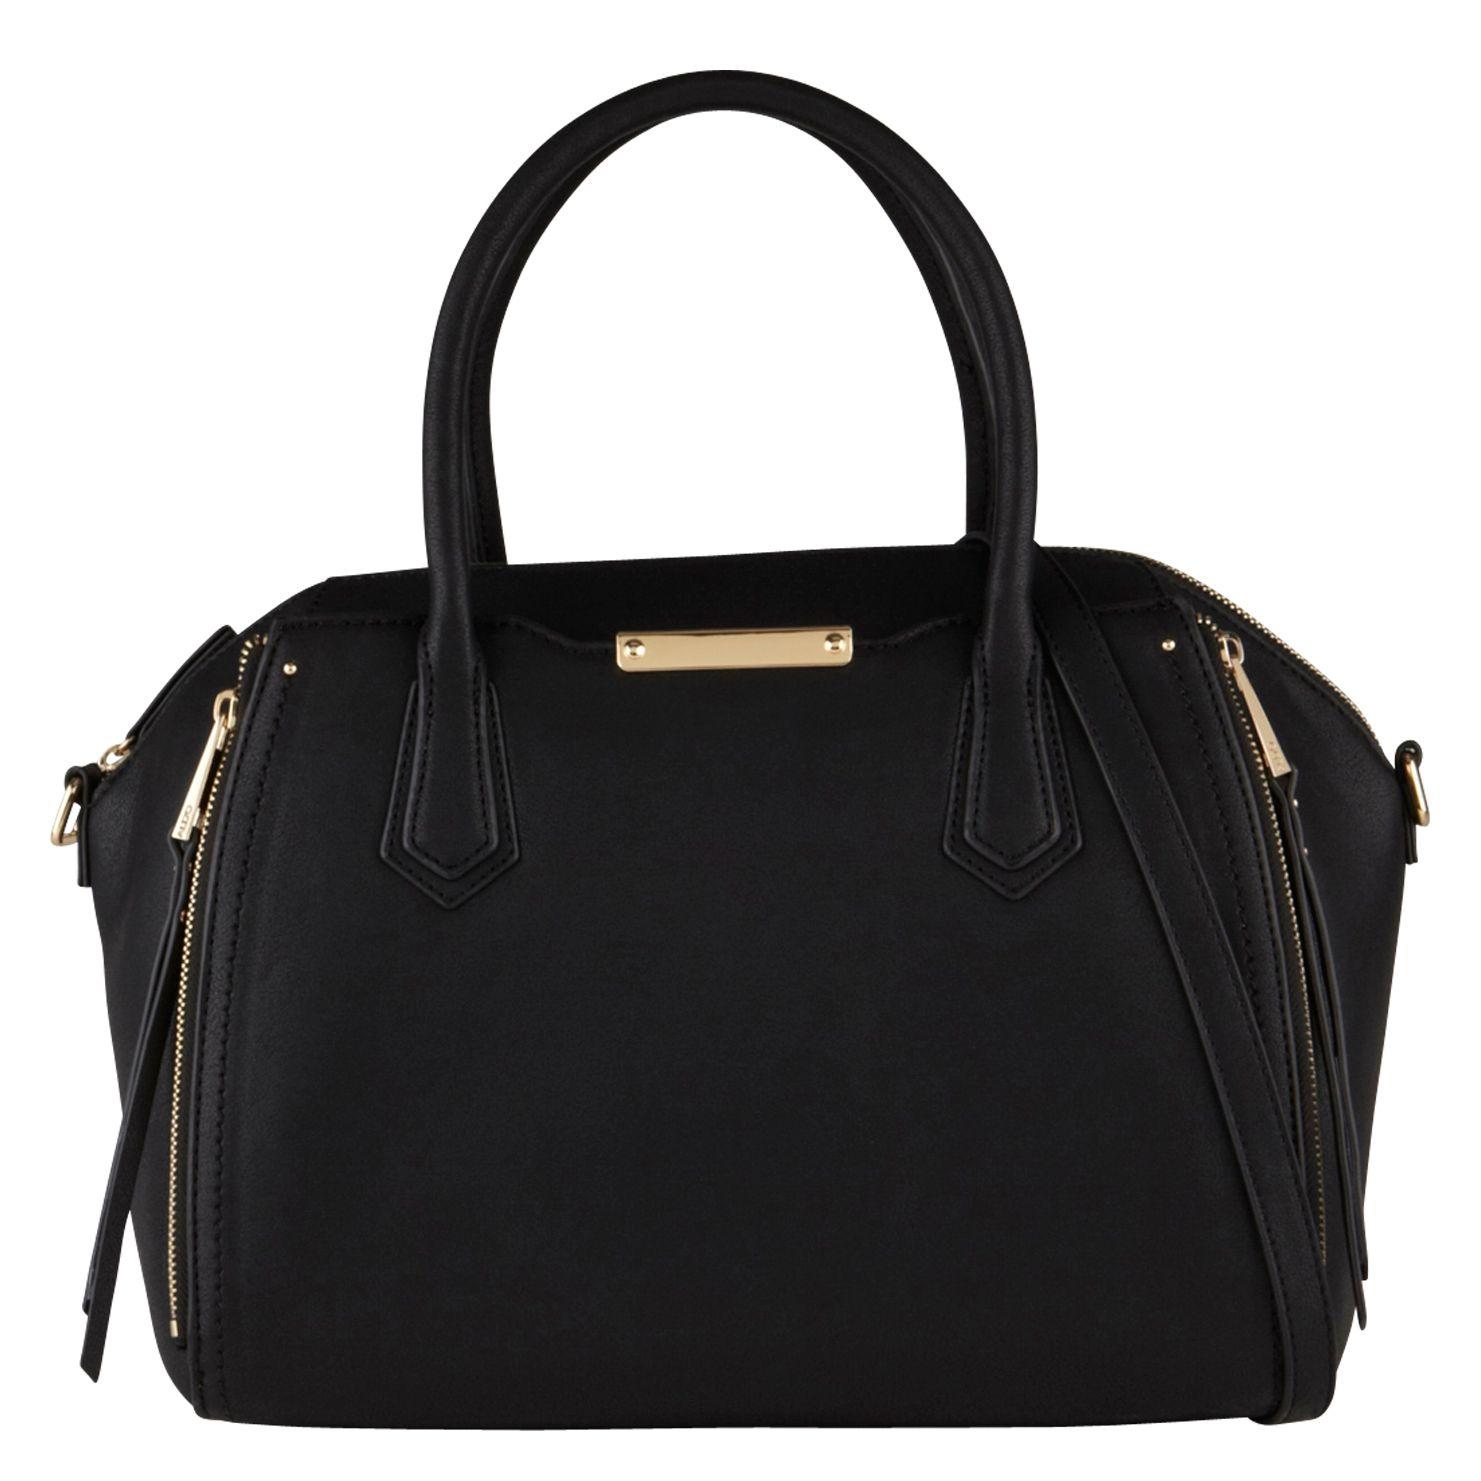 Aldo Halifax Satchel Bag in Black | Lyst